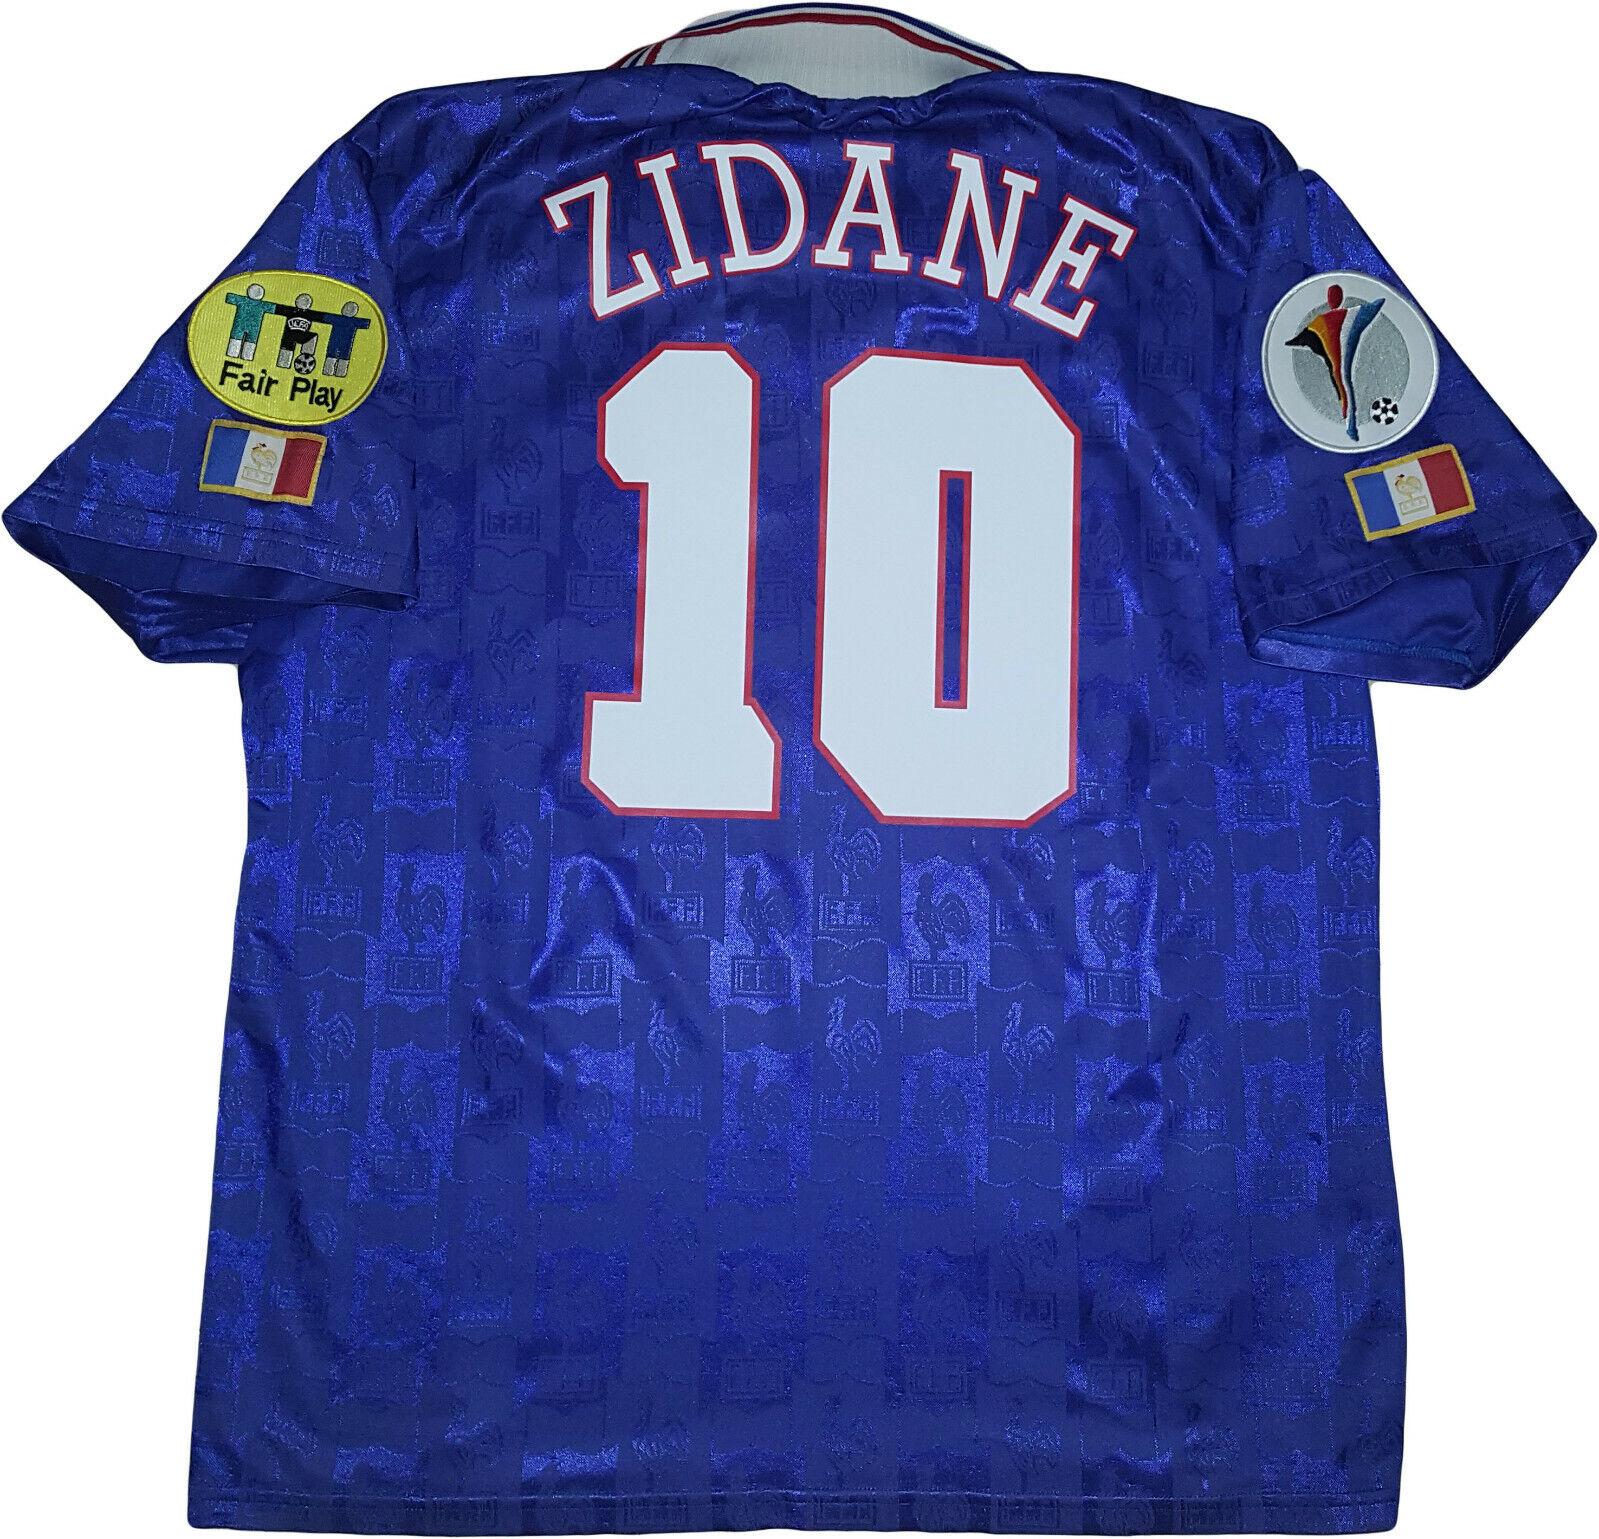 Maglia Francia Zidane 1996 Euro germany Vintage Adidas shirt Jersey home